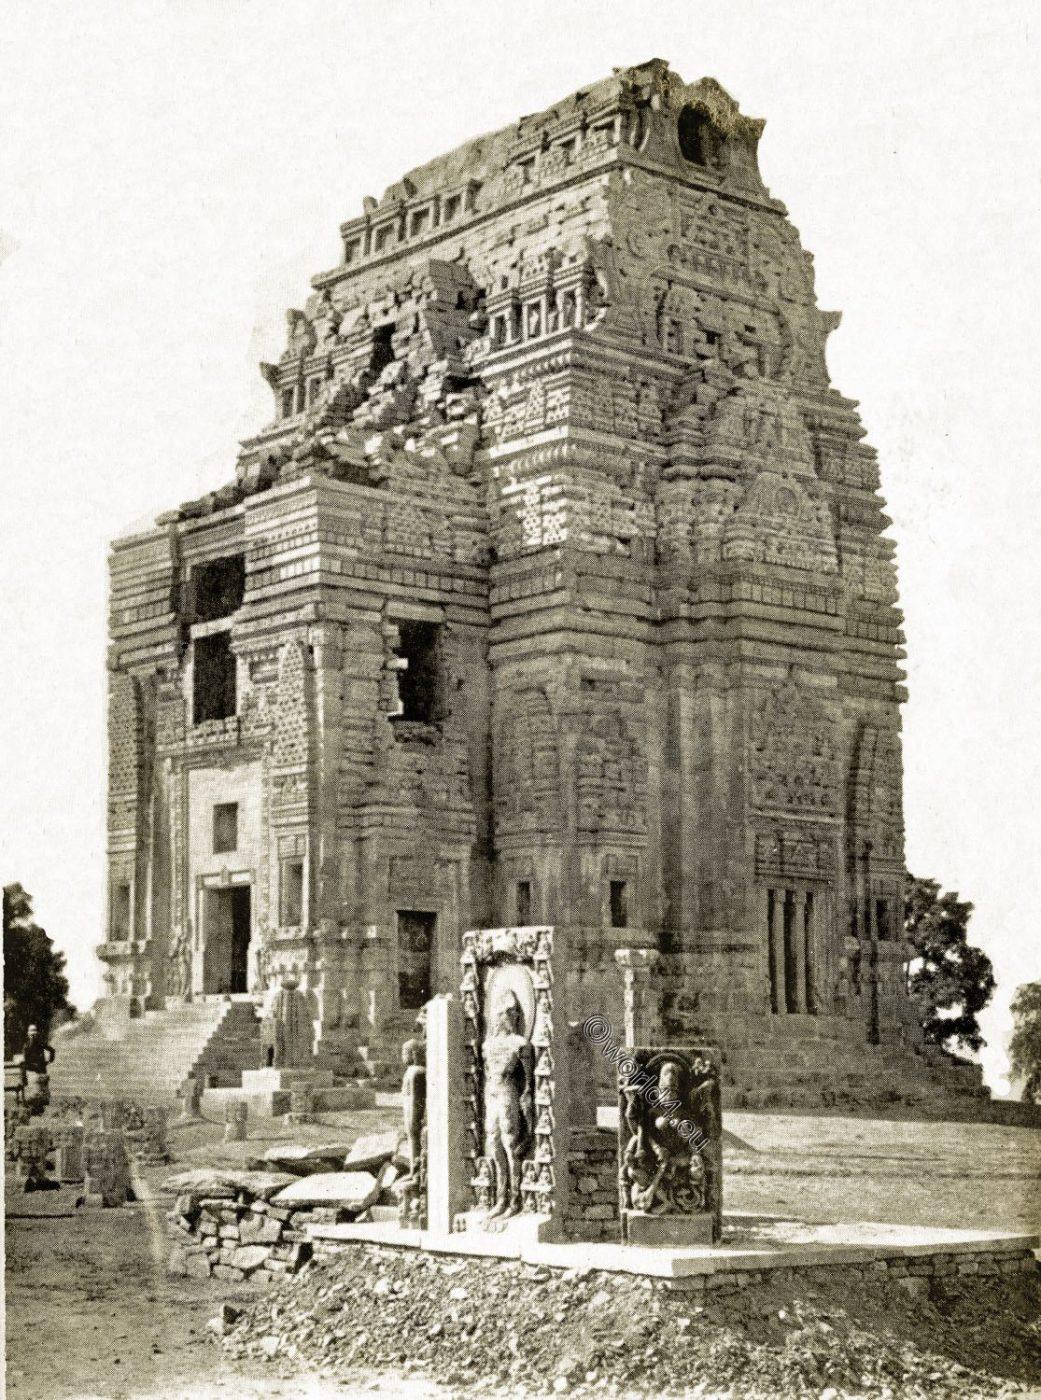 Teli Ka Mandir, Telika Temple, Tali, Mundir, Gwalior, Fort, Madhya Pradesh, India